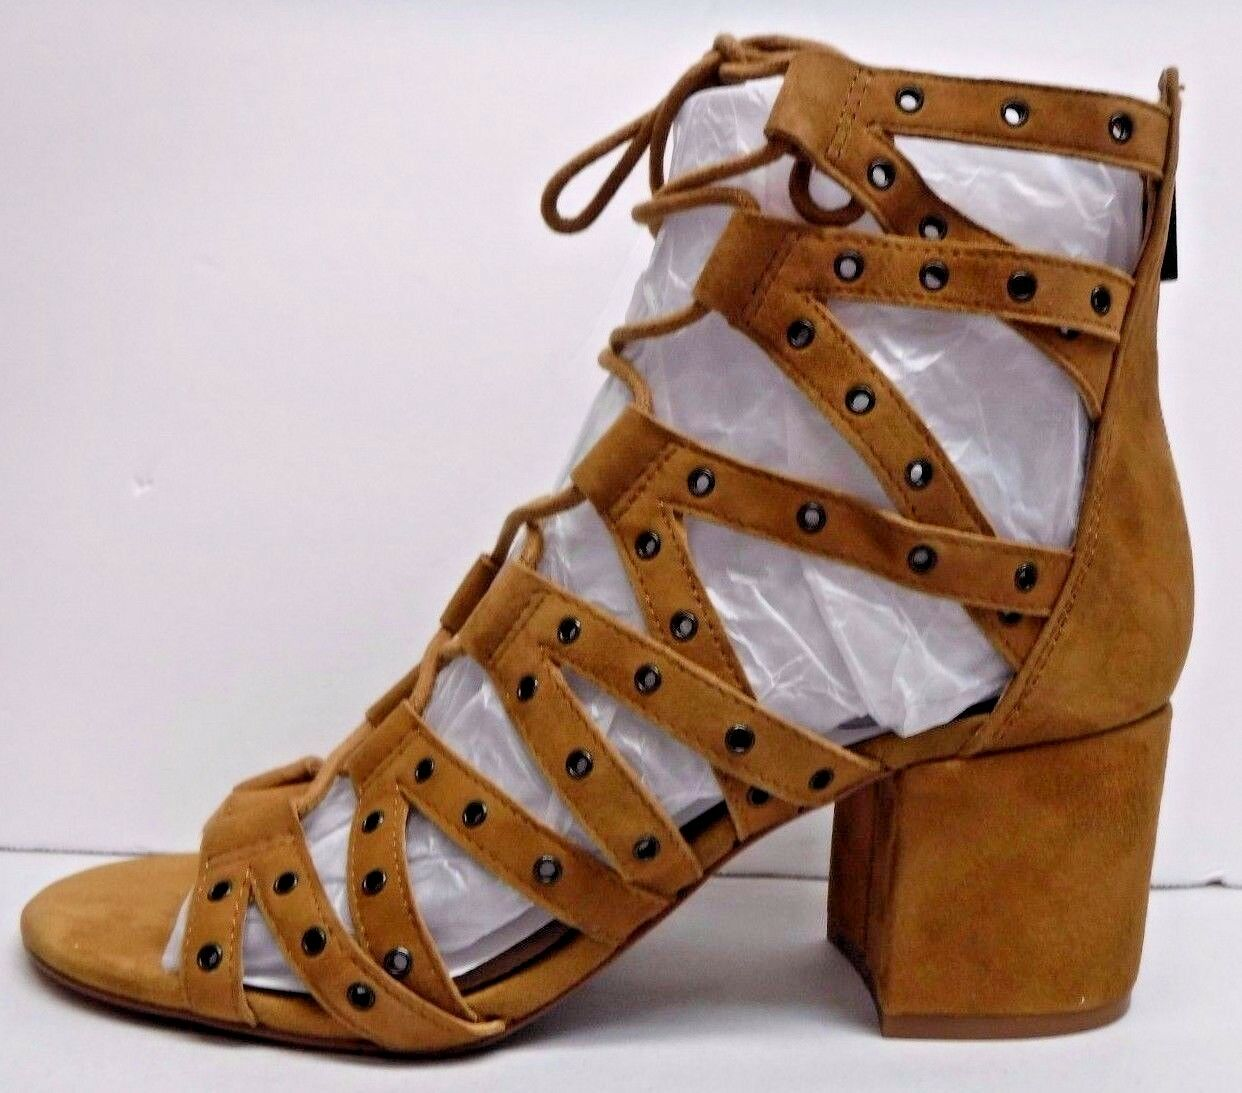 Jessica Braun Simpson Größe 7 Honey Braun Jessica Leder Sandales Heels New Damenschuhe Schuhes 1ba622